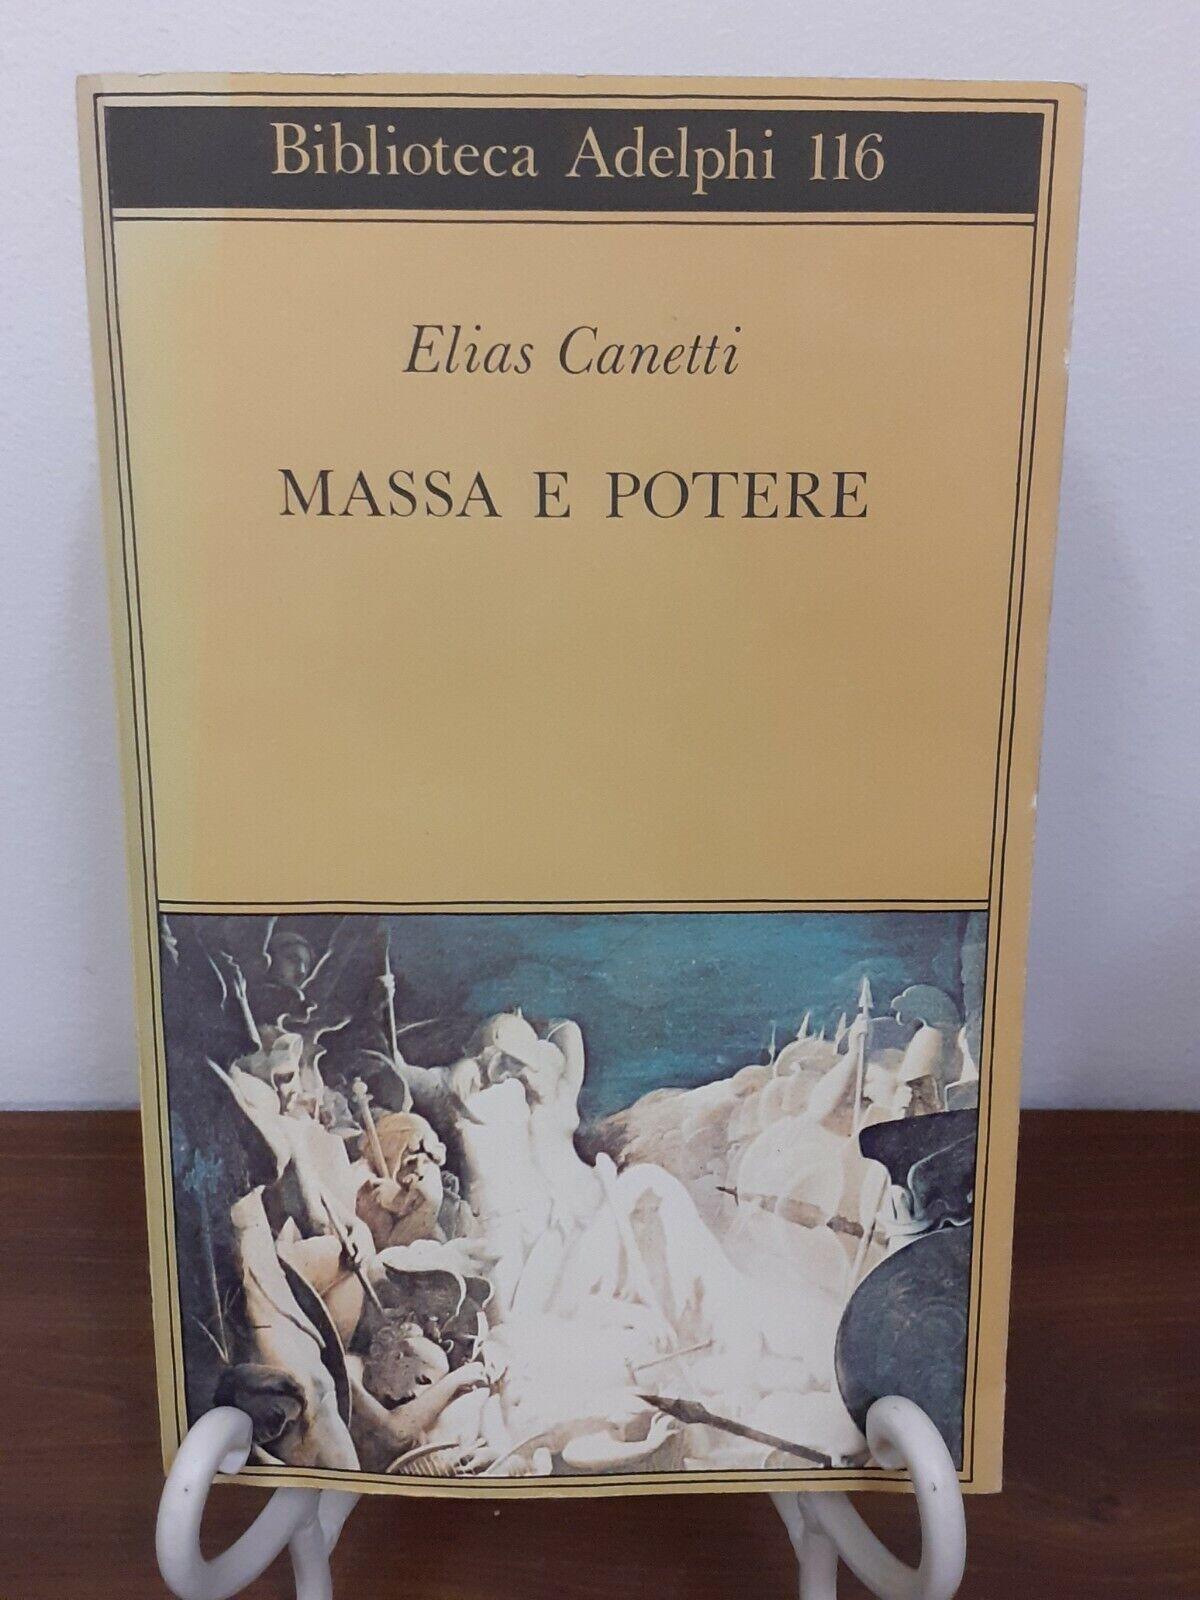 ELIAS CANETTI - MASSA E POTERE [ ADELPHI, 1999 ]